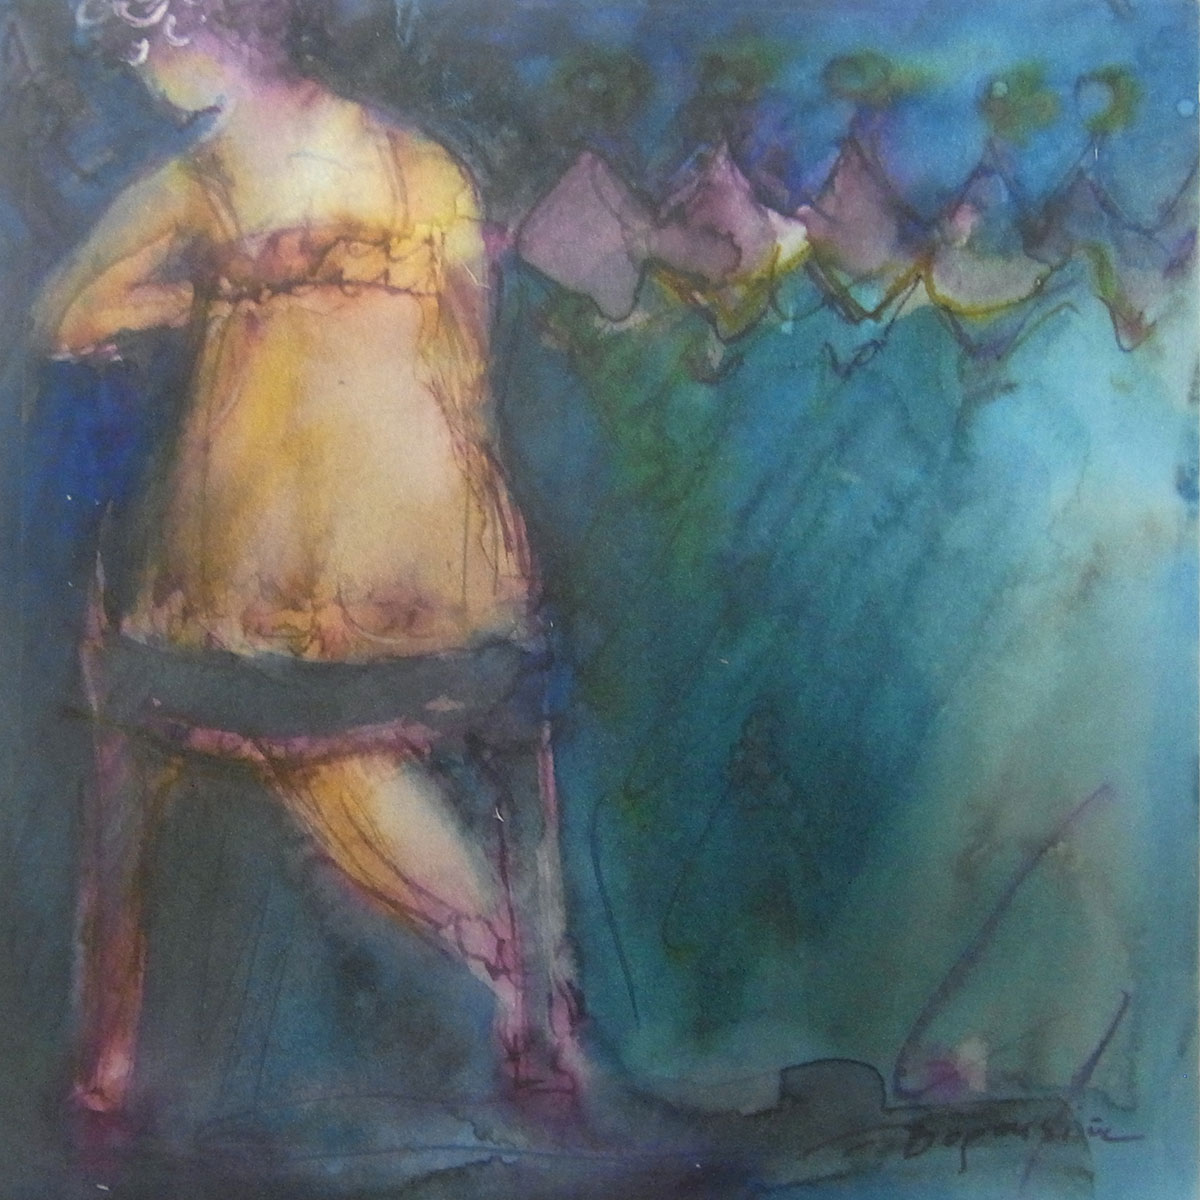 femme aquarelle 8